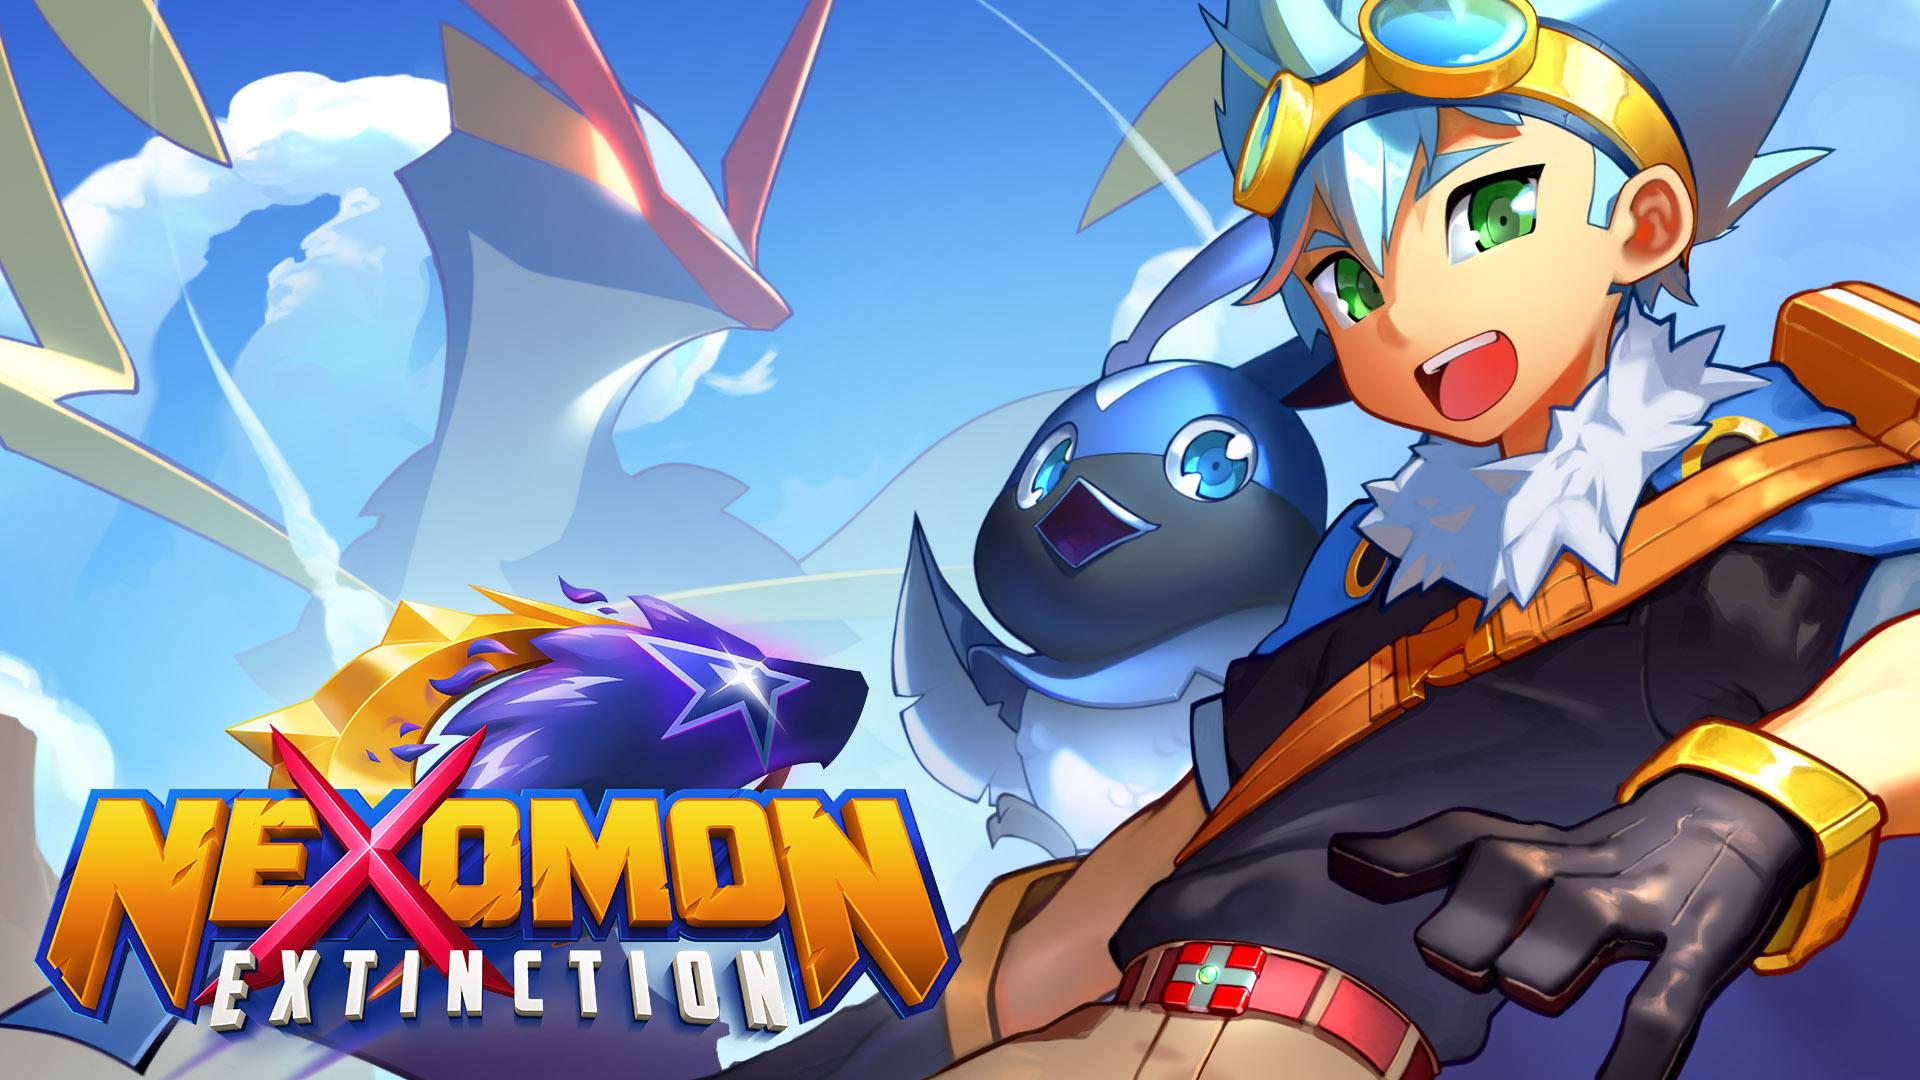 Read more about the article Nexomon: Extinction